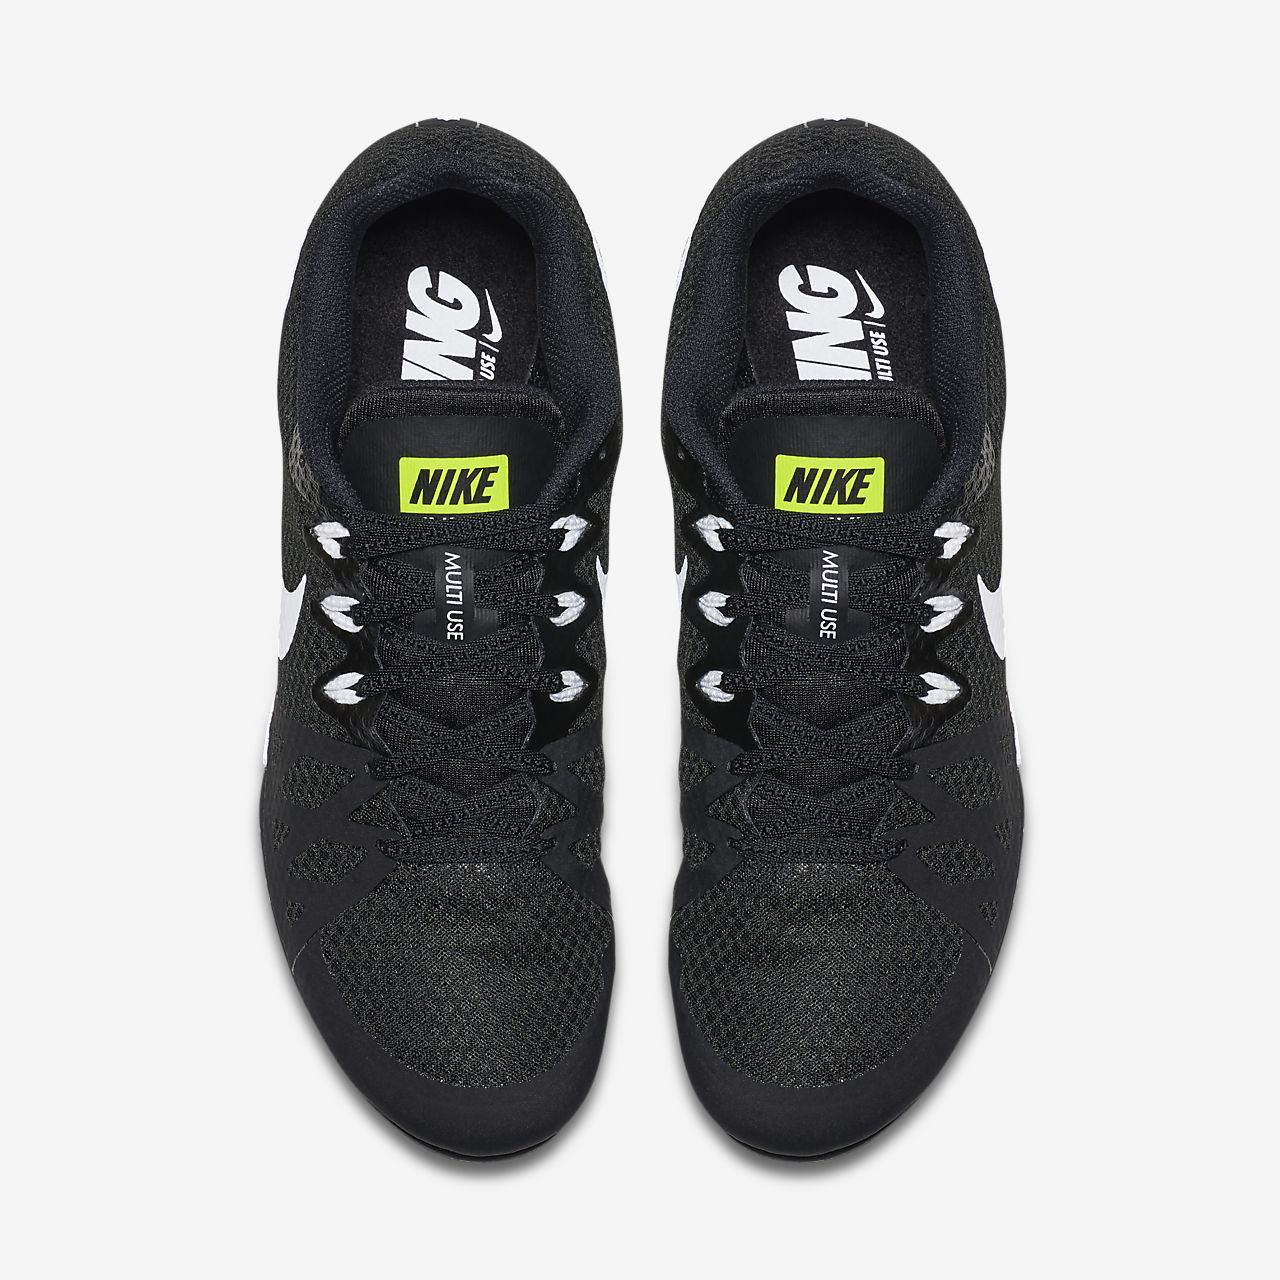 scarpe chiodate nike ostacoli